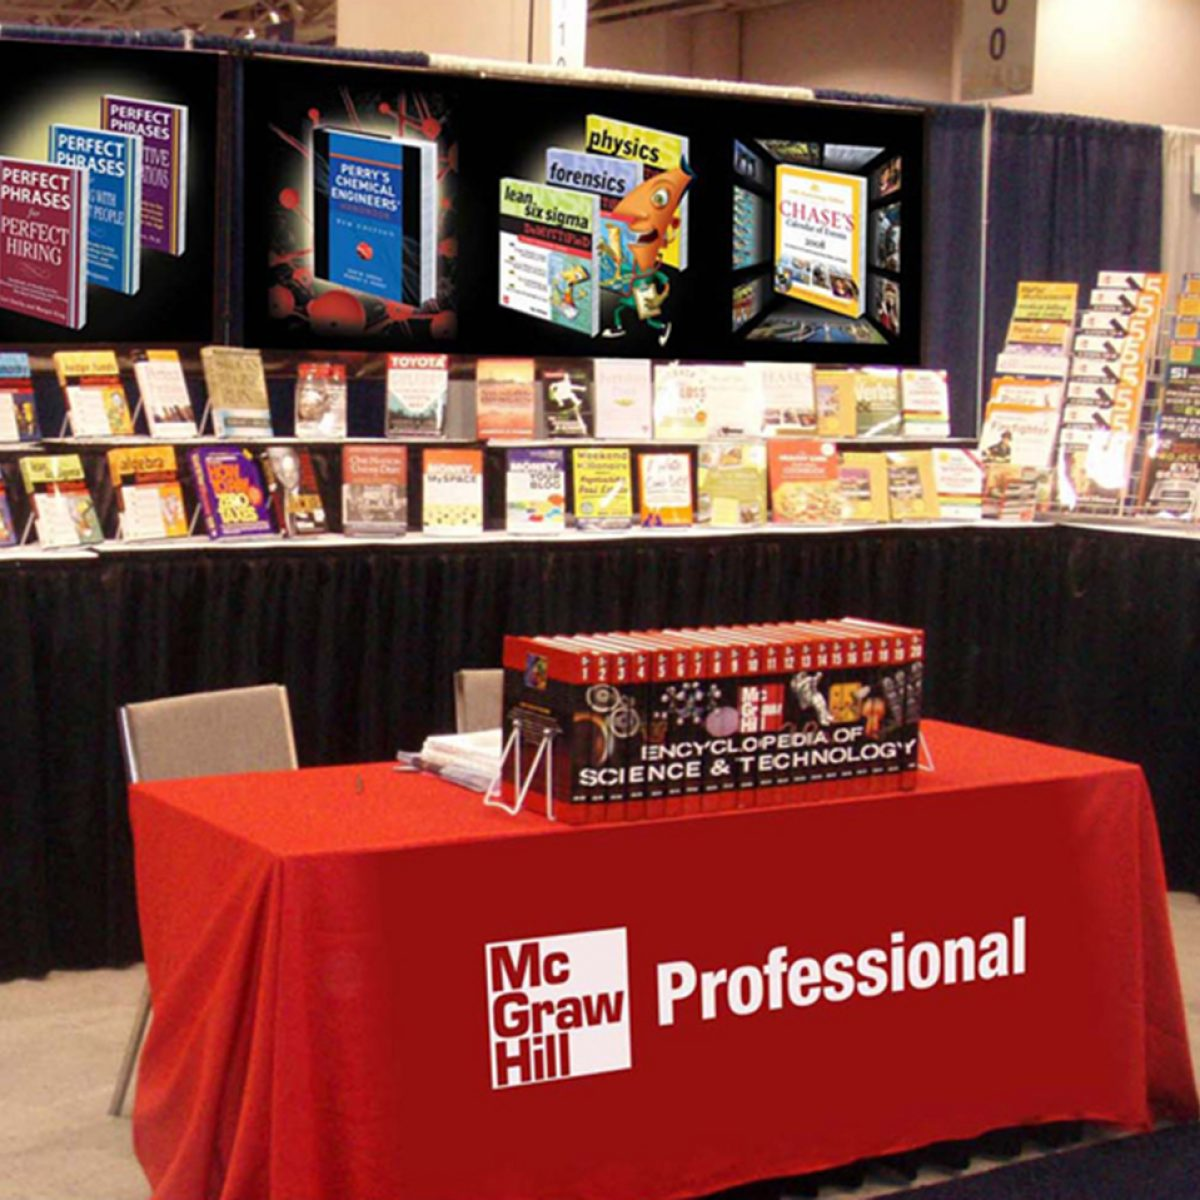 22) McGraw Hill Professional